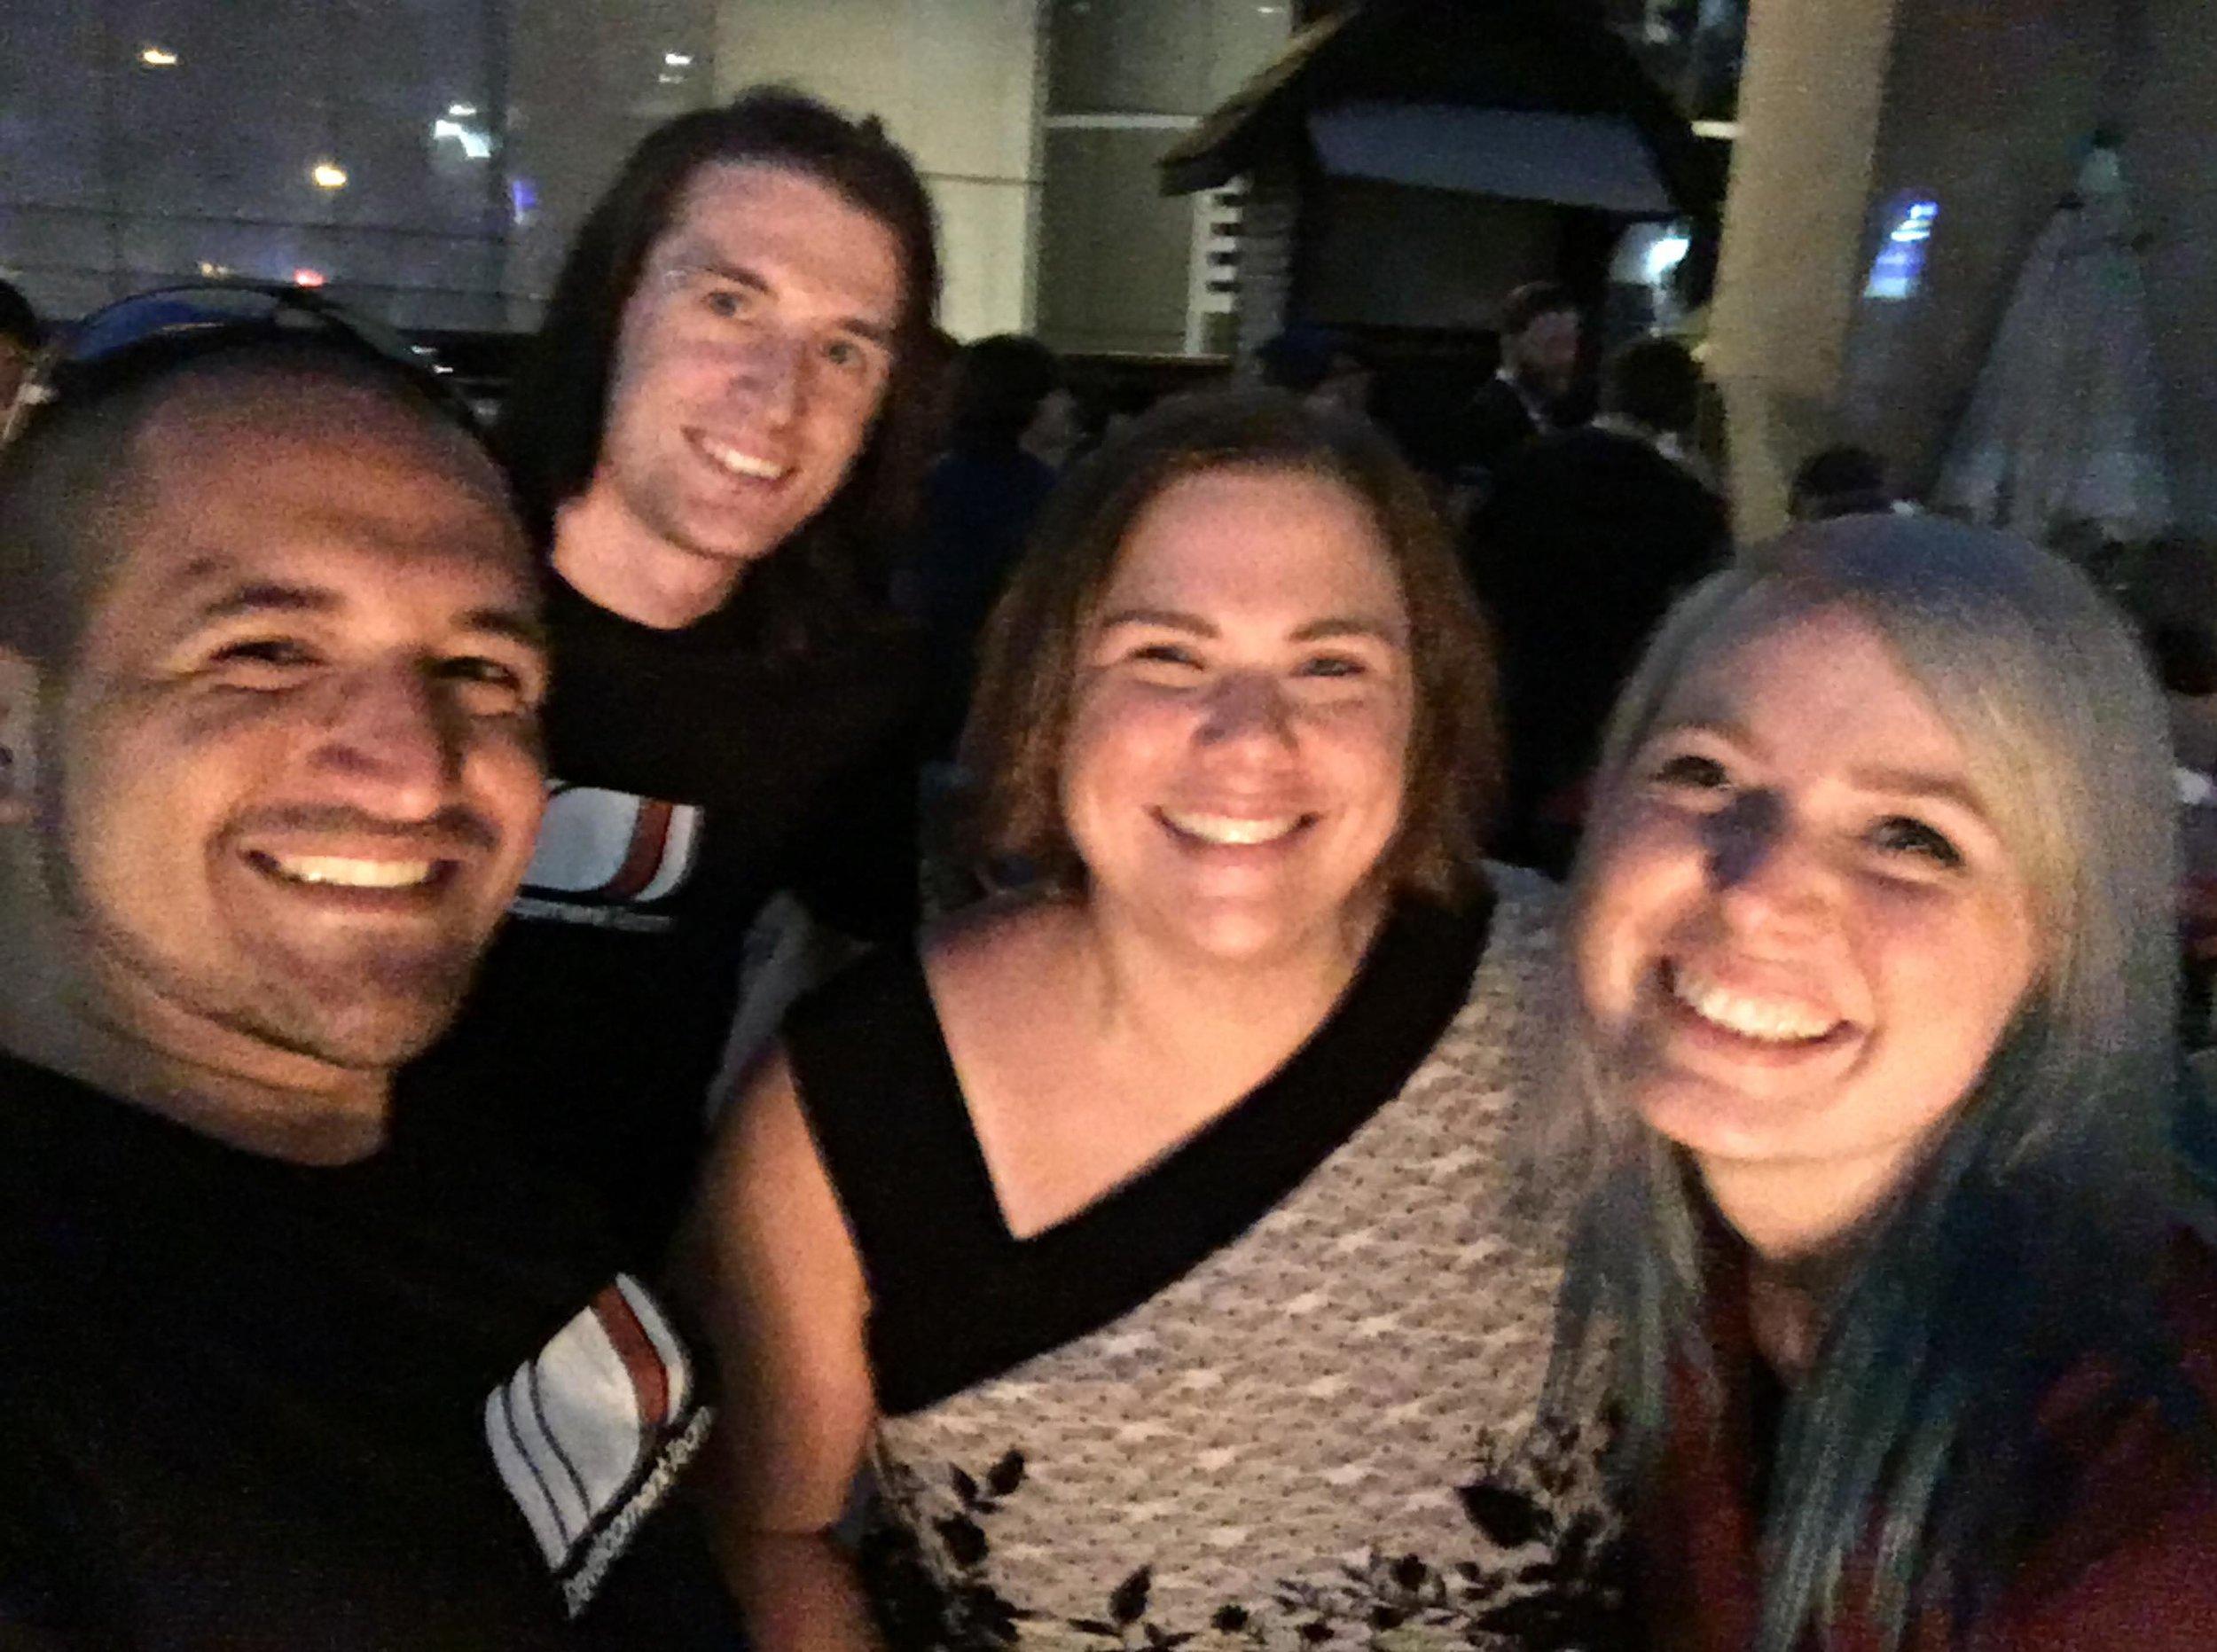 Audio QA selfie with Morgan, Tyler, and also Laila Berzins, the voice actor who voiced Gondul, the Muspelheim Valkyrie!